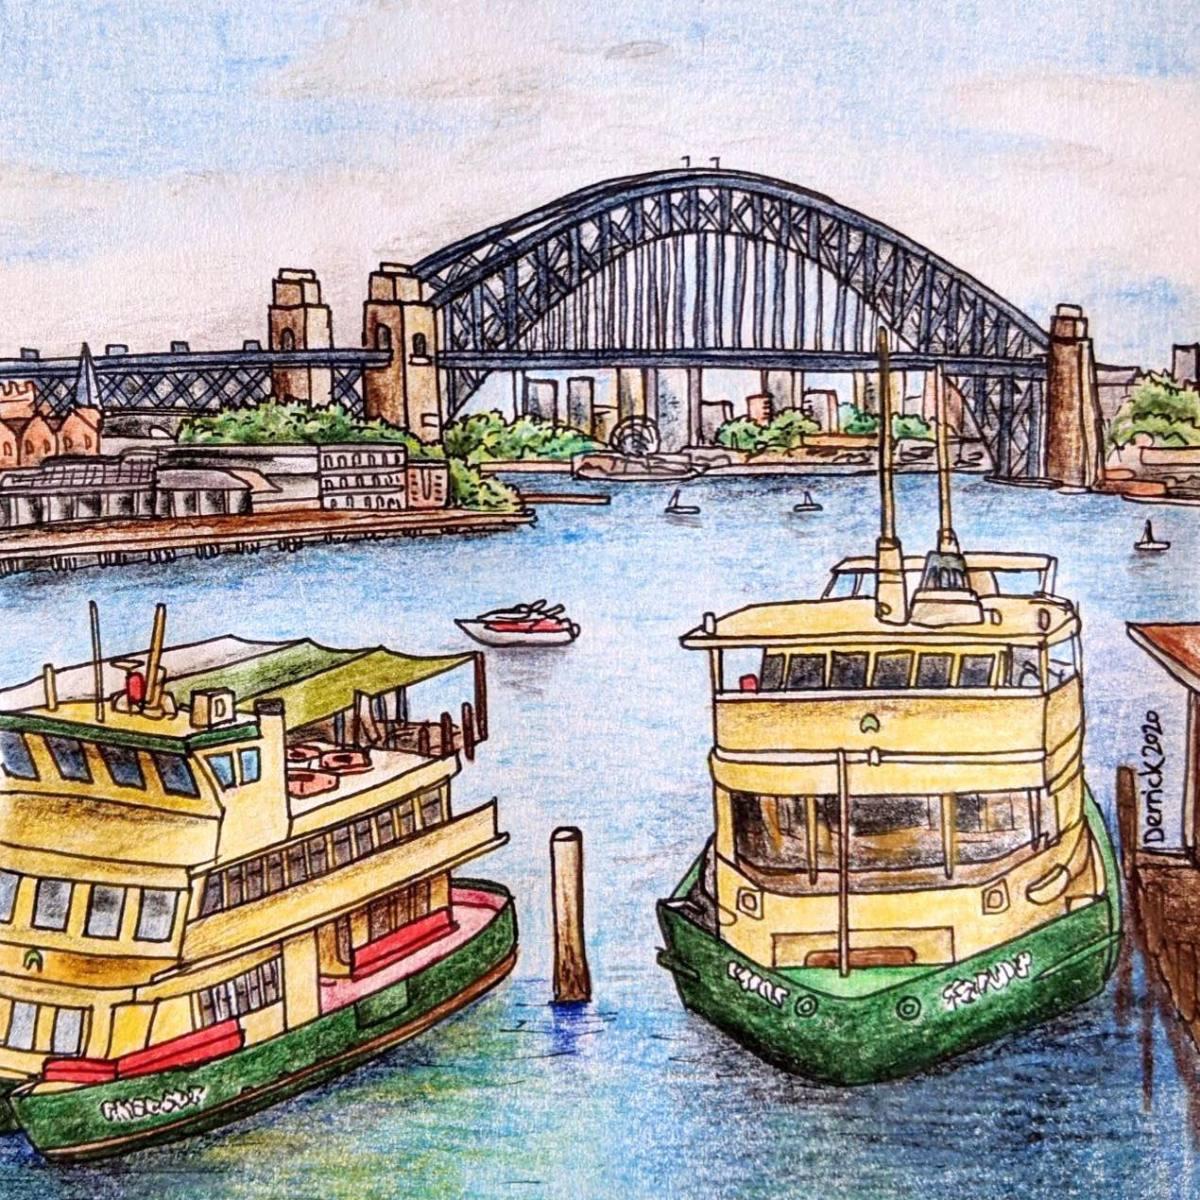 Urban sketching Sydney harbour landscape of sydney ferries and harbour bridge